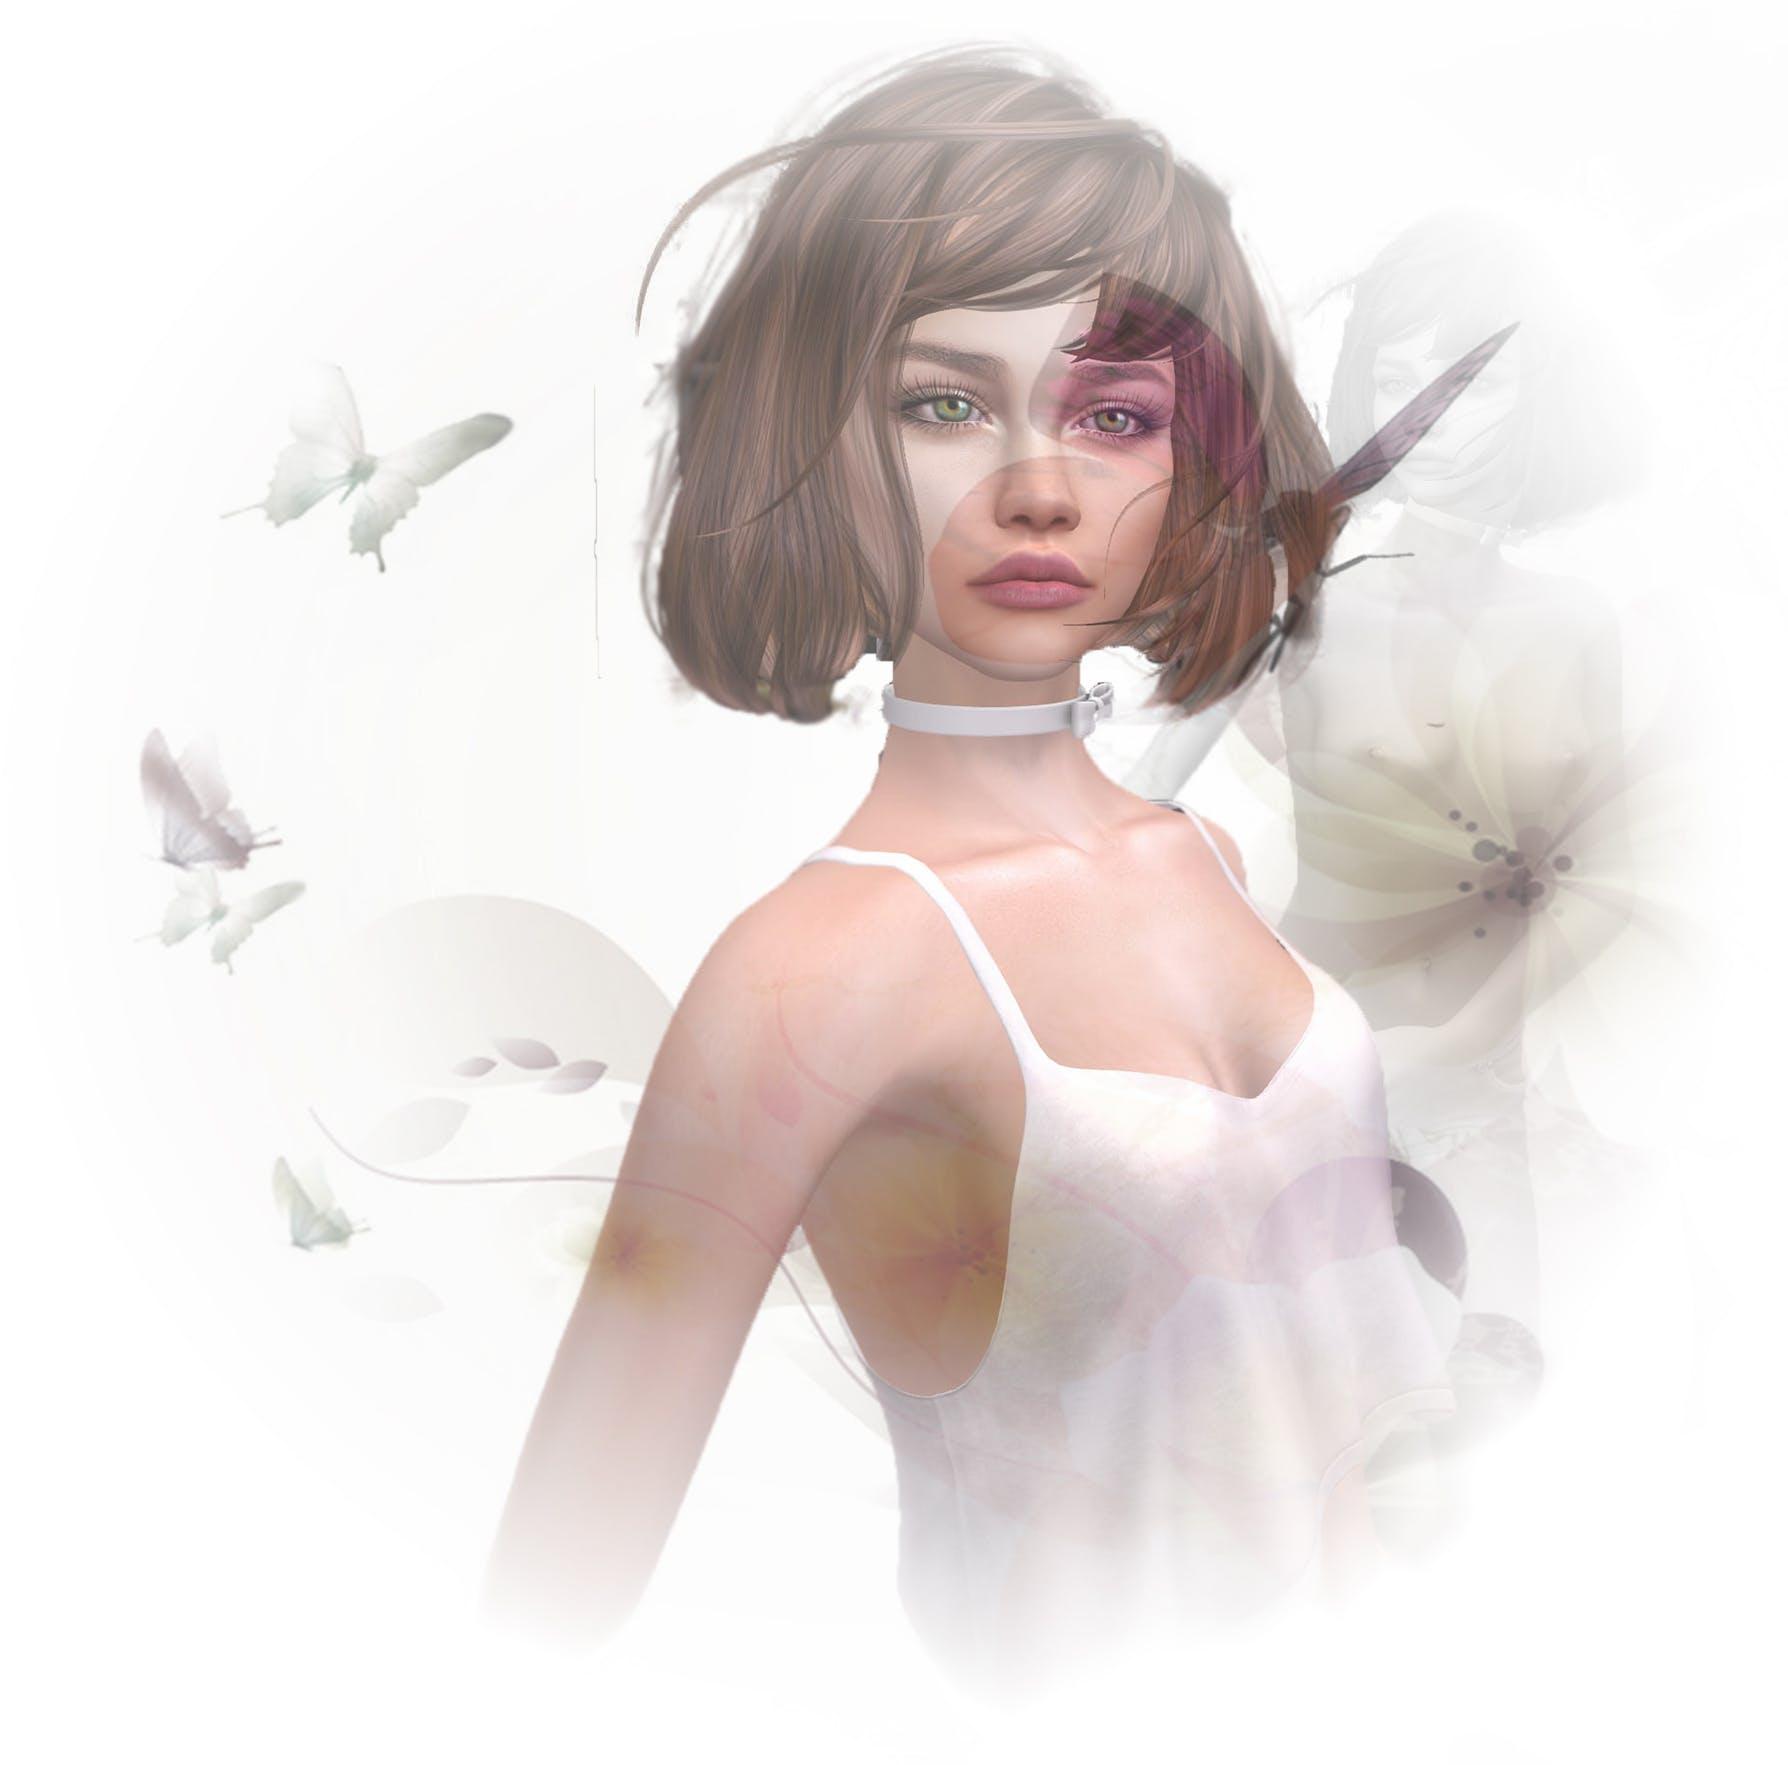 Free stock photo of beautiful girl, digital art, nude